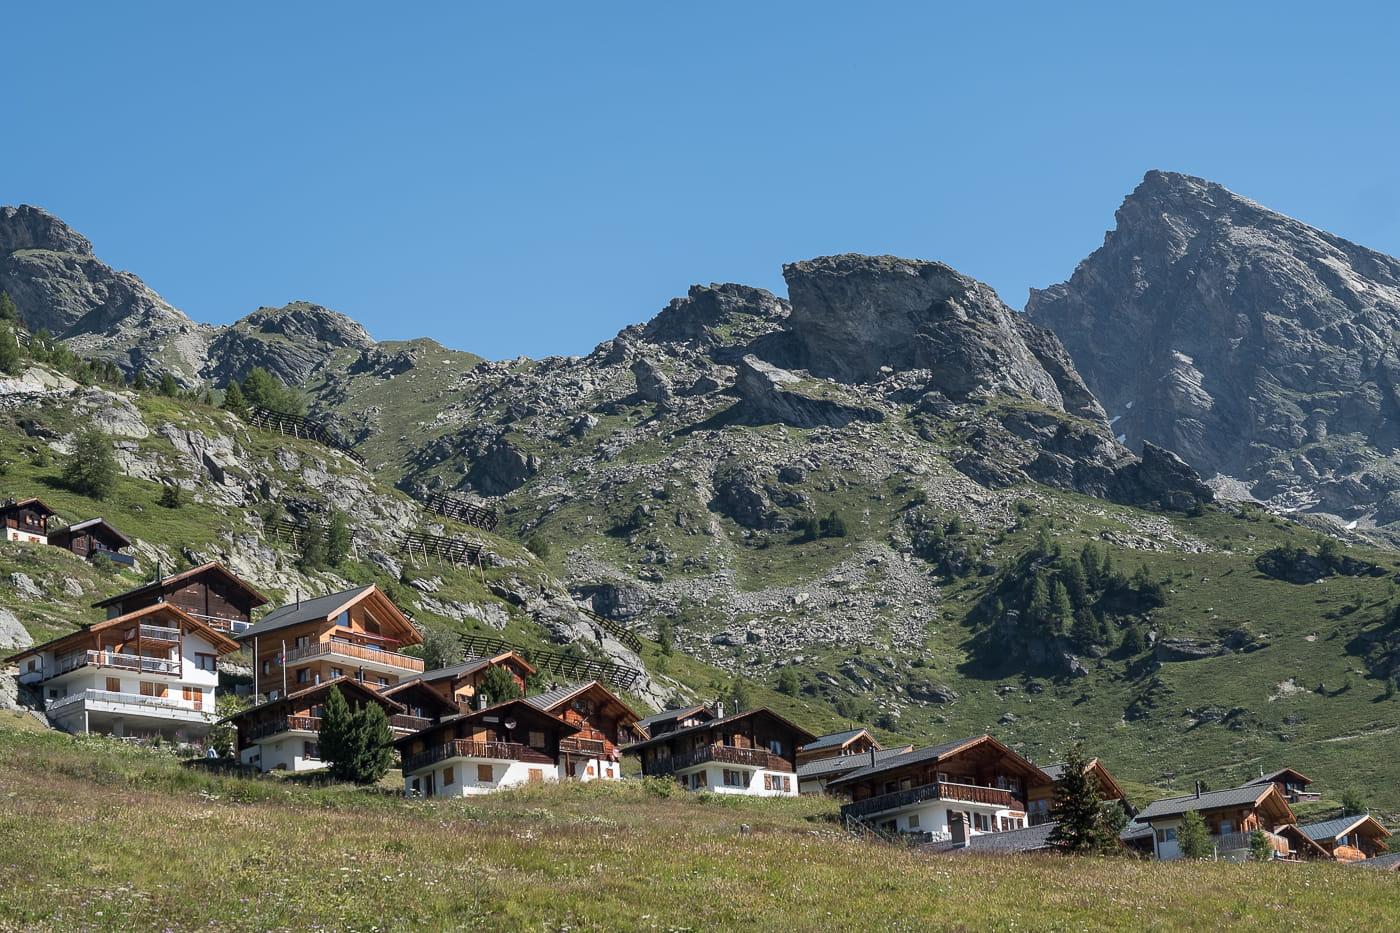 Lauchernalp Dorf